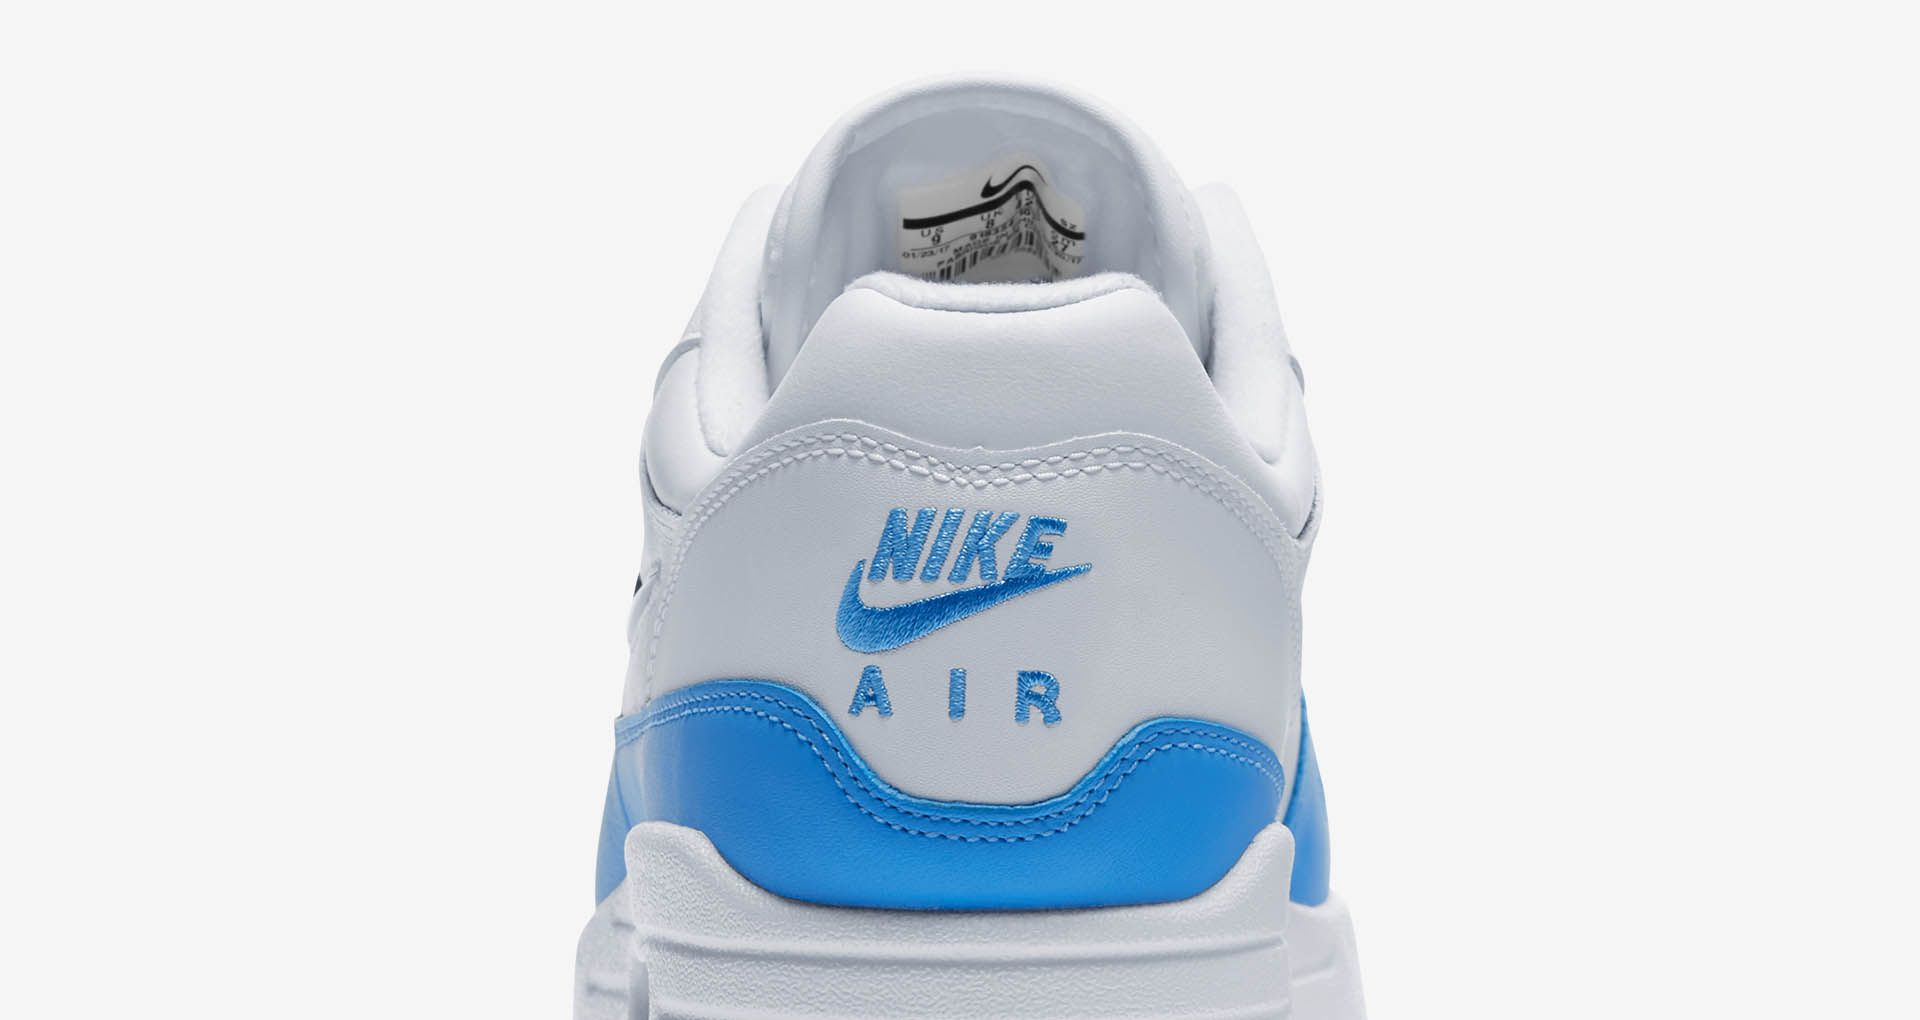 Nike Air Max 1 Premium Jewel 'White & University Blue